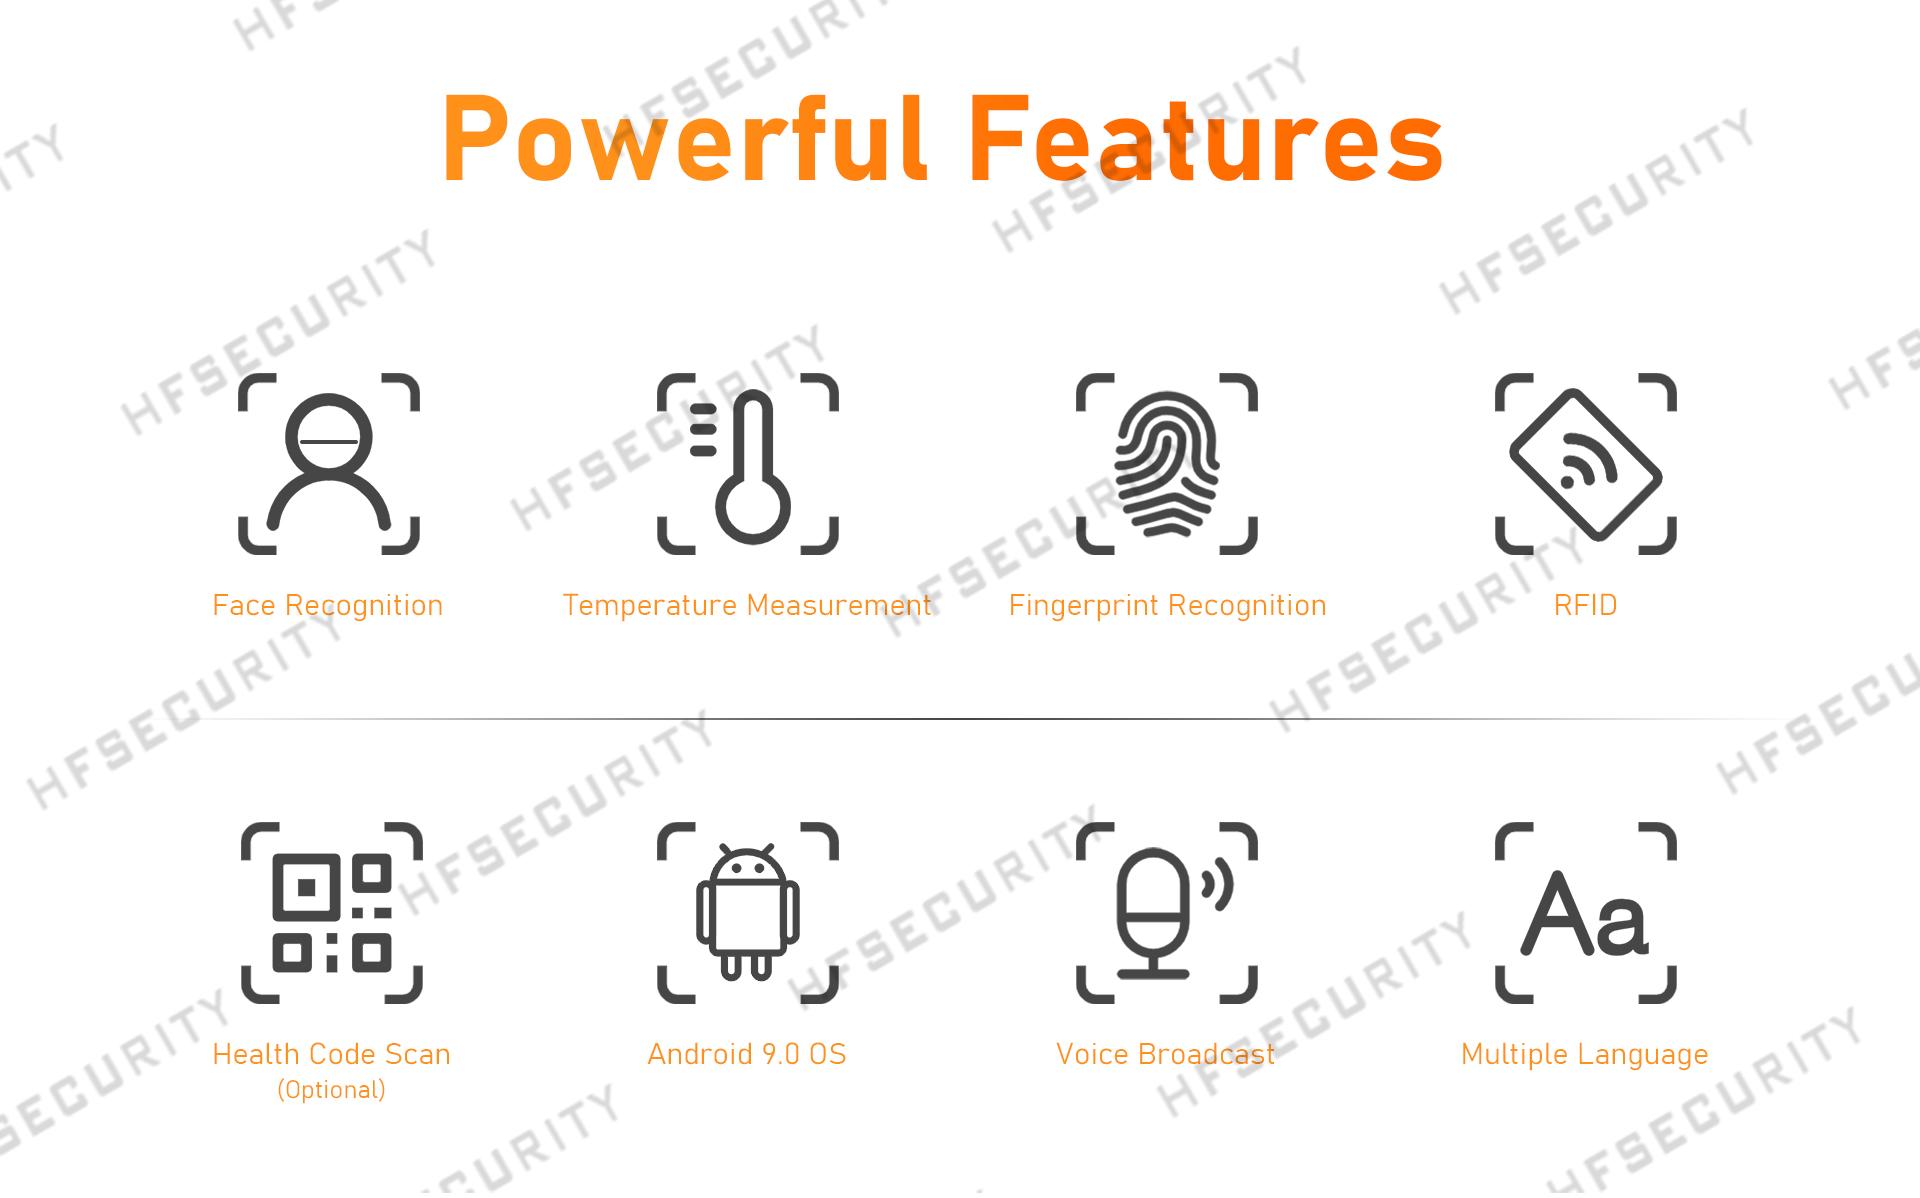 HFSecurity RA08T Fingerprint Face Recognition Device